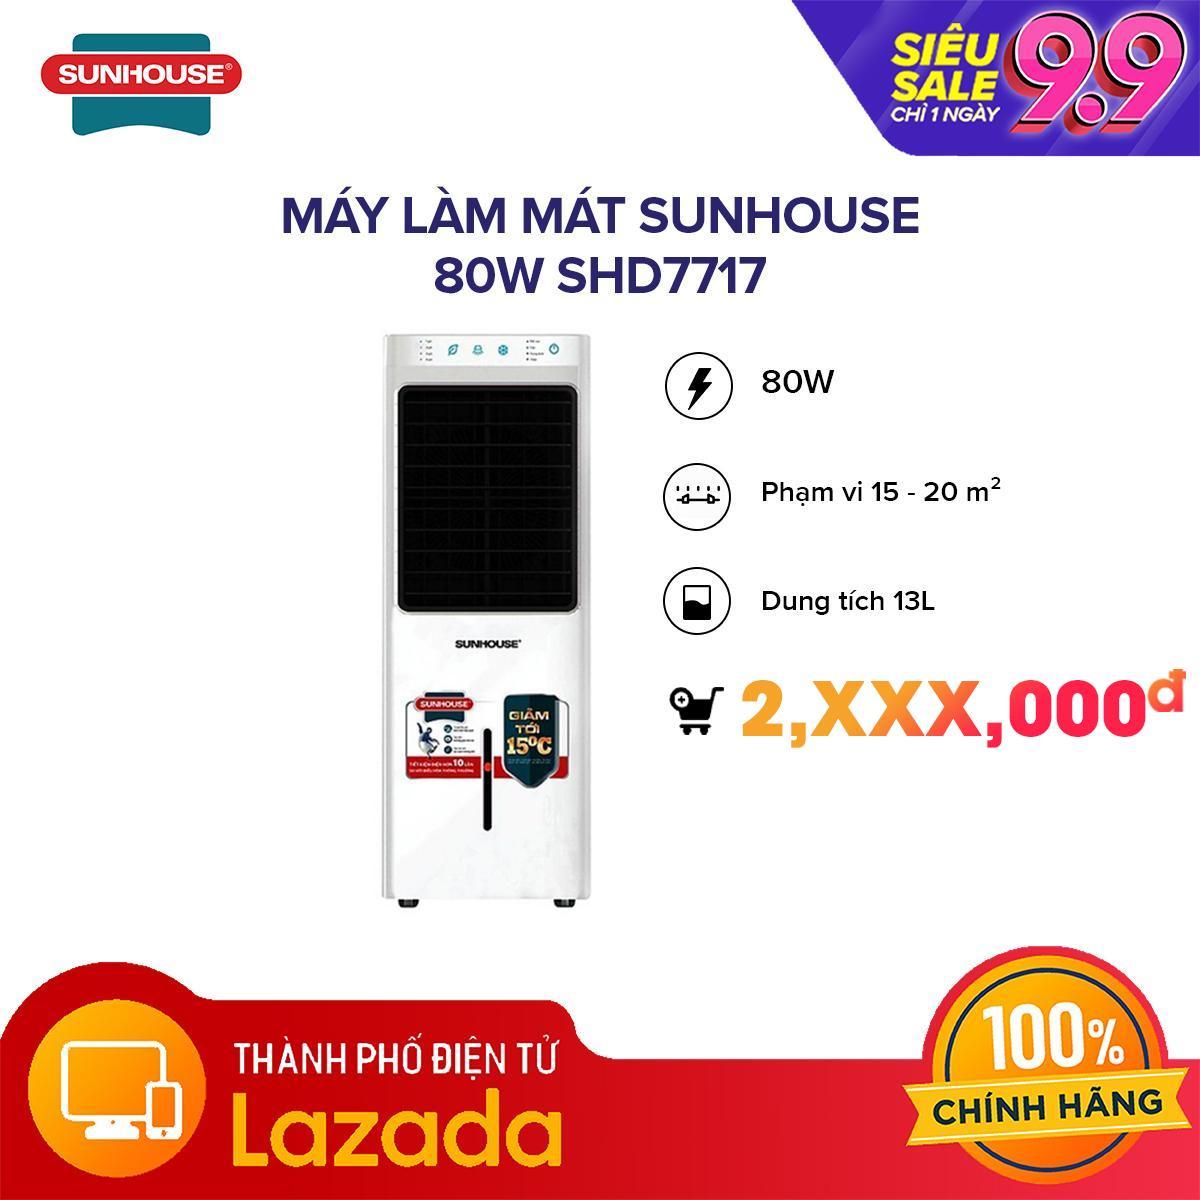 Giá Máy làm mát Sunhouse 80W SHD7717